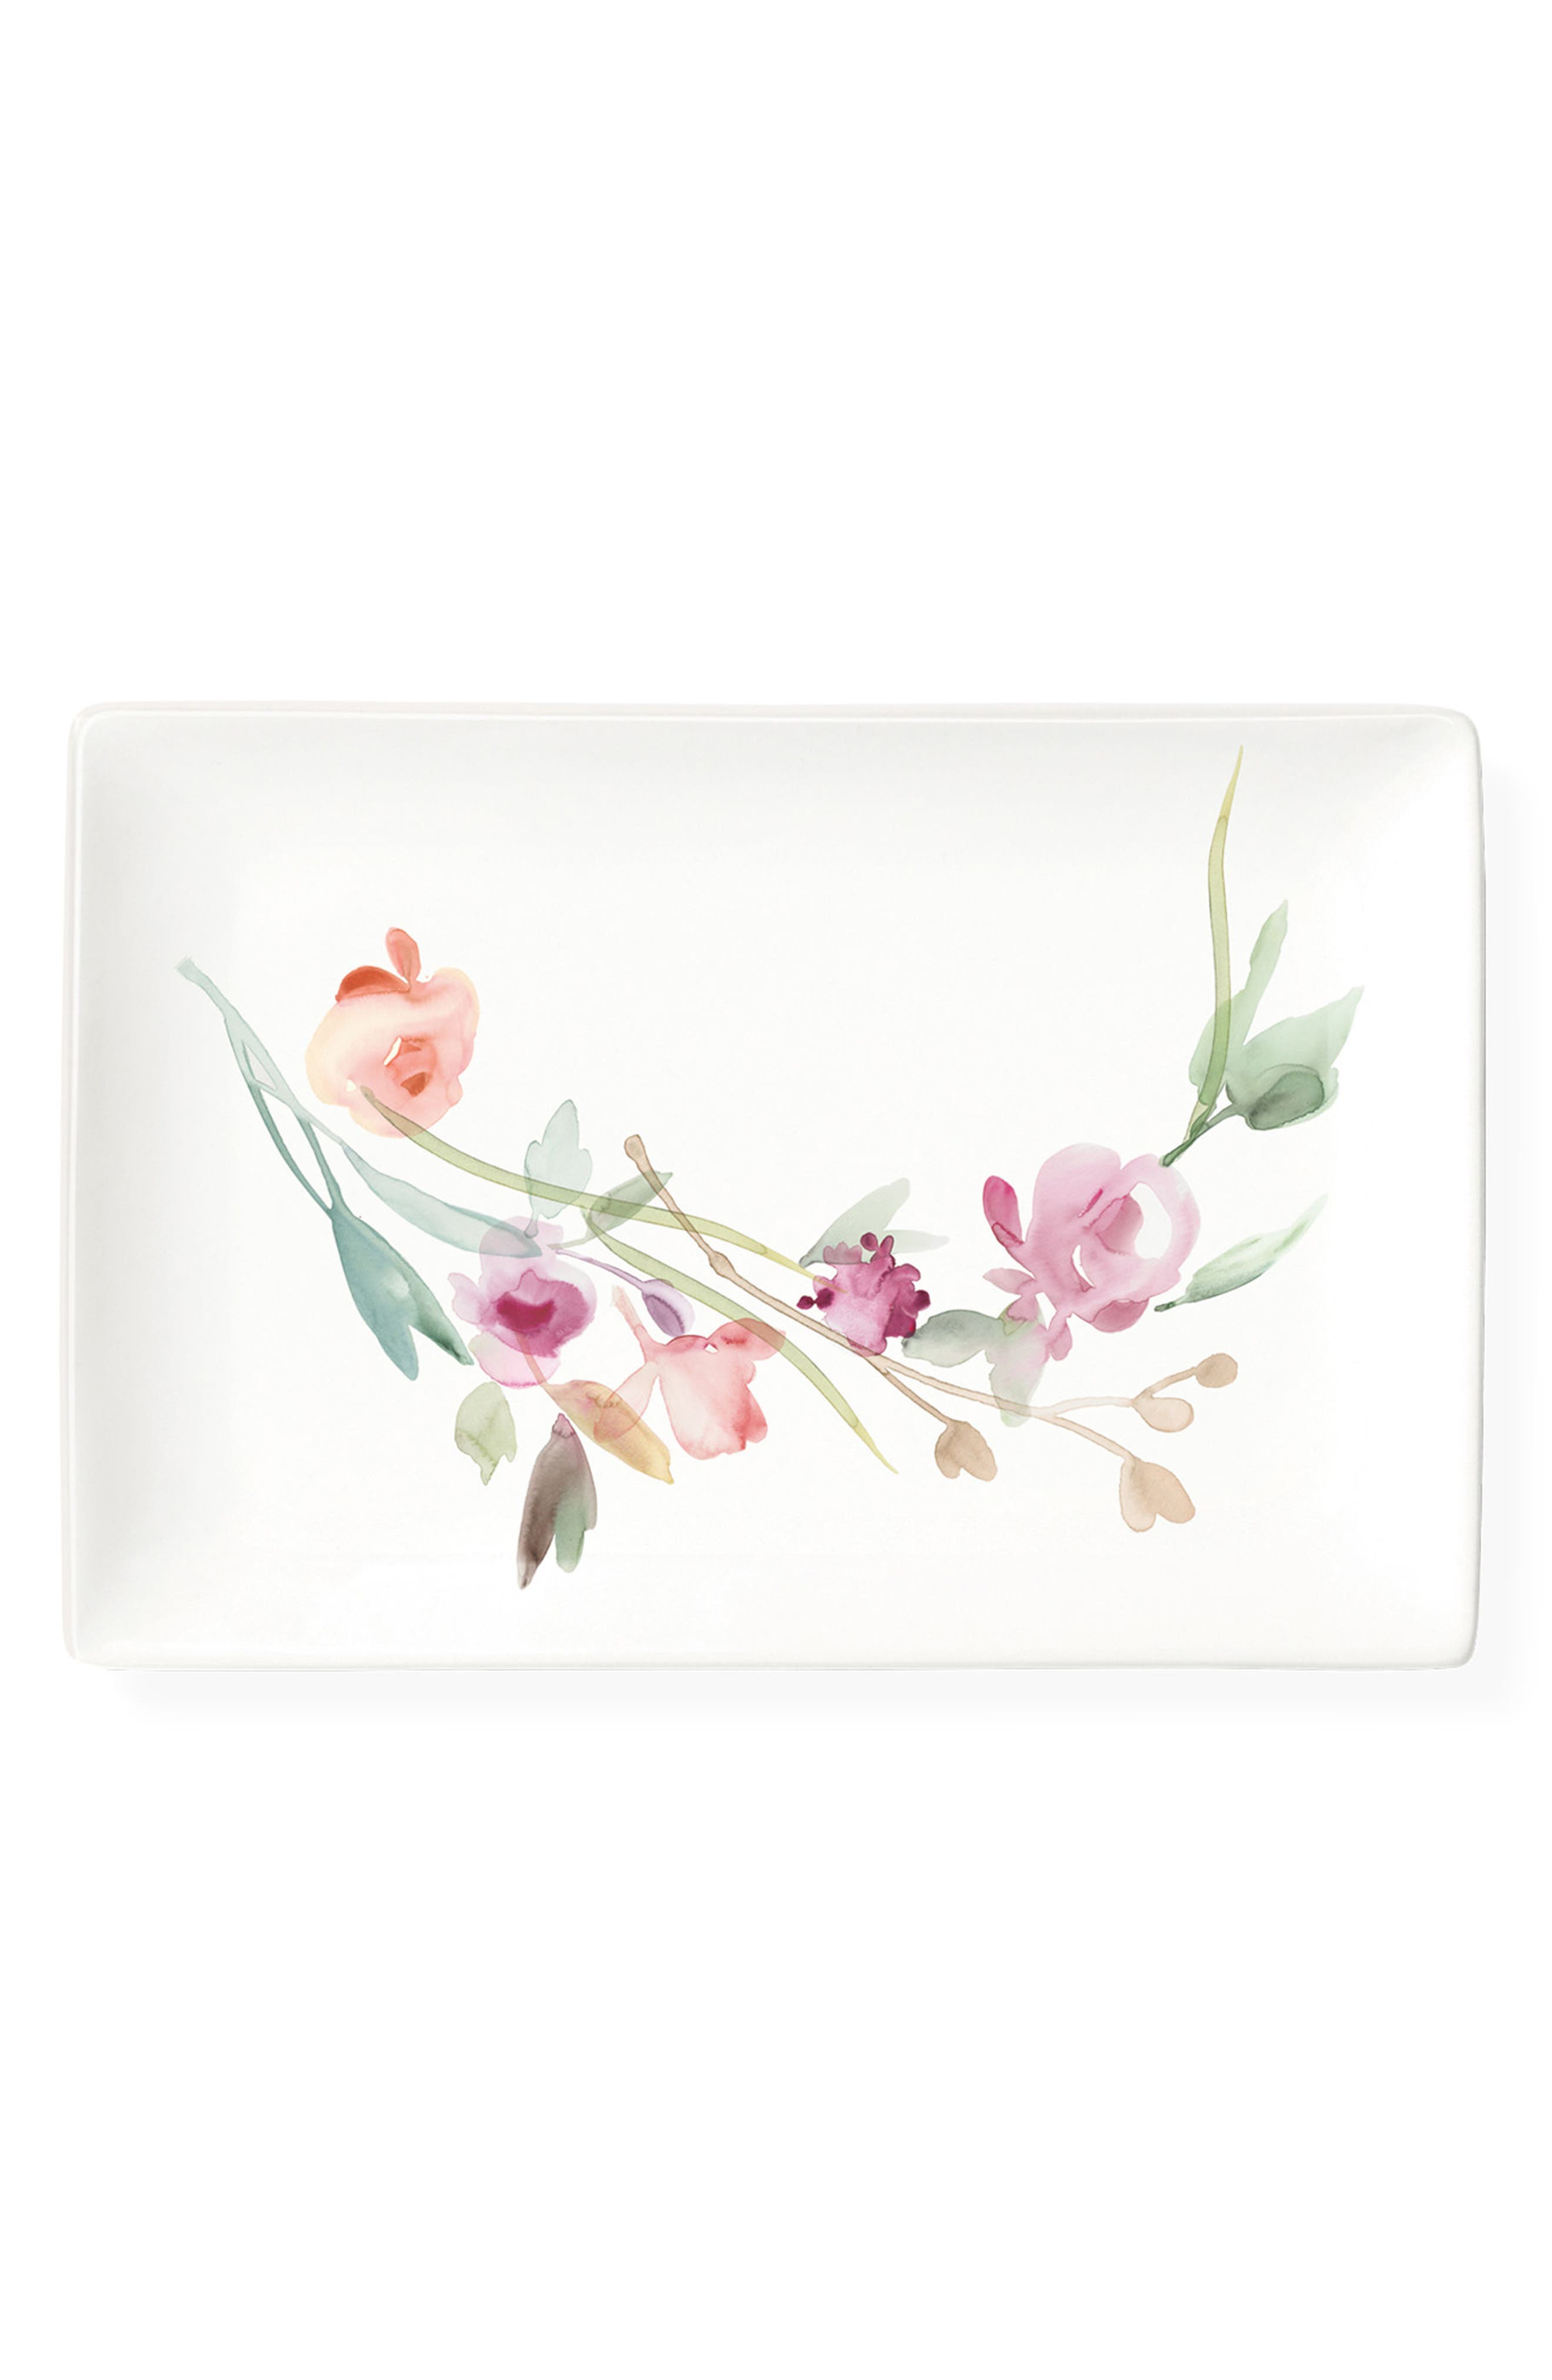 Floral Ceramic Trinket Tray,                             Main thumbnail 1, color,                             651